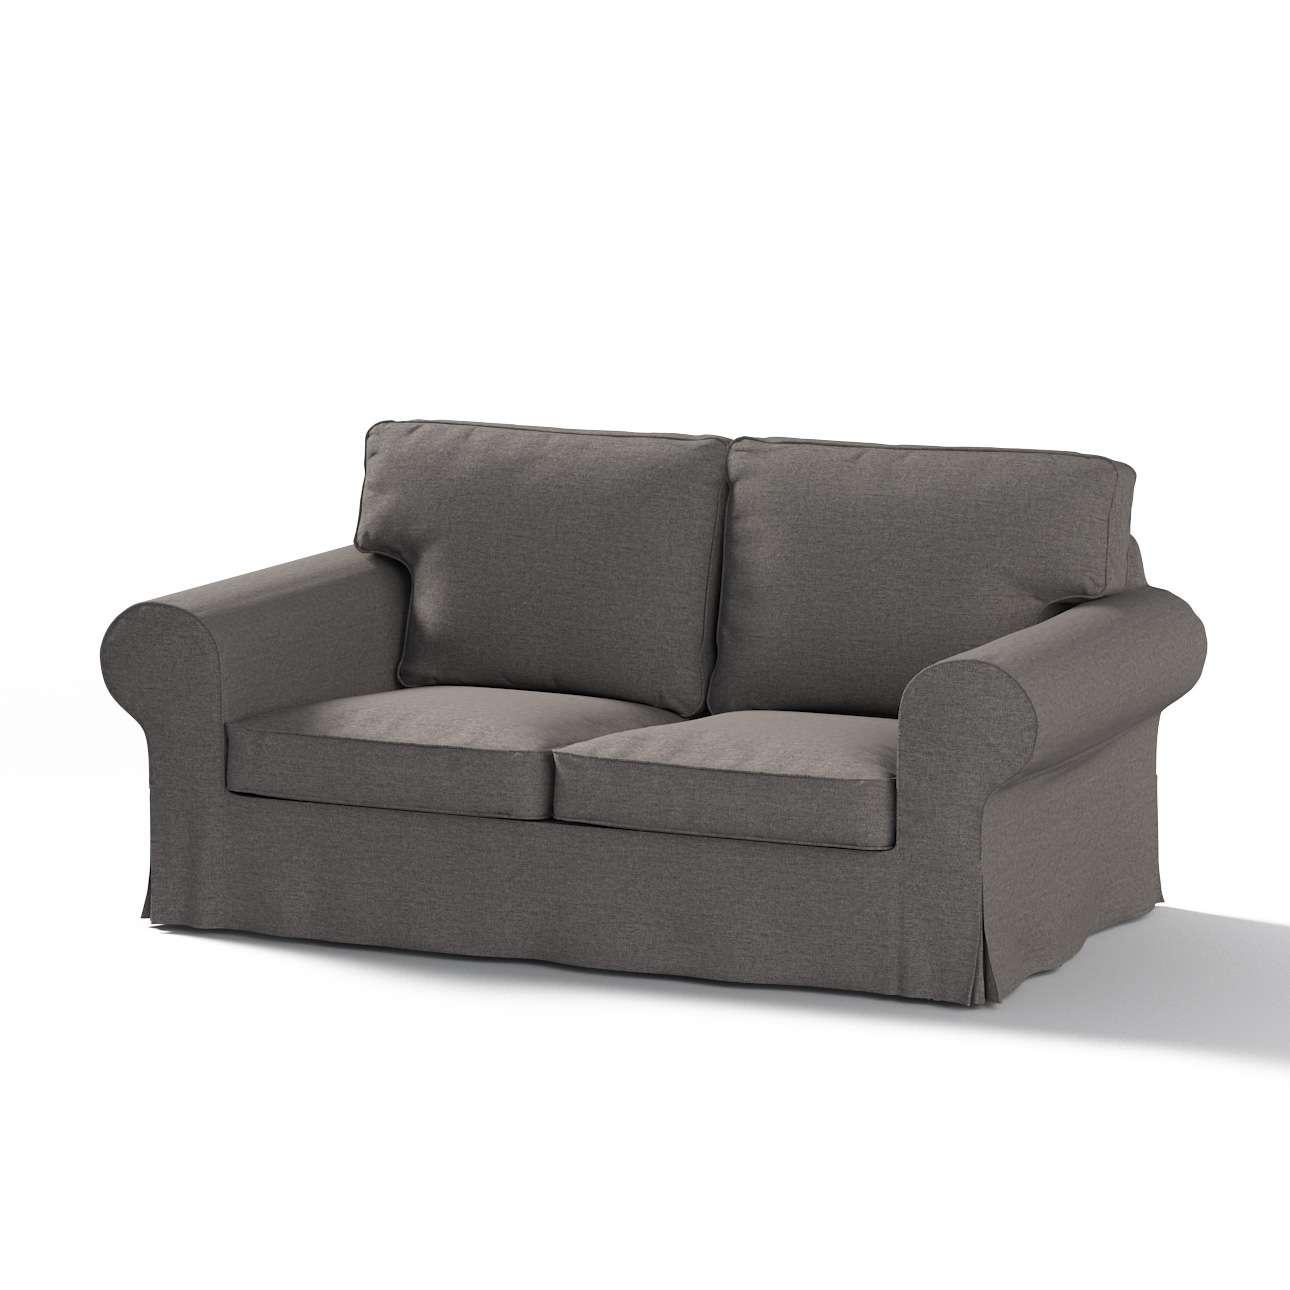 Ektorp 2 sæder sovesofa gammel model<br/>Bredde ca 195cm Betræk uden sofa fra kollektionen Edinburgh, Stof: 115-77